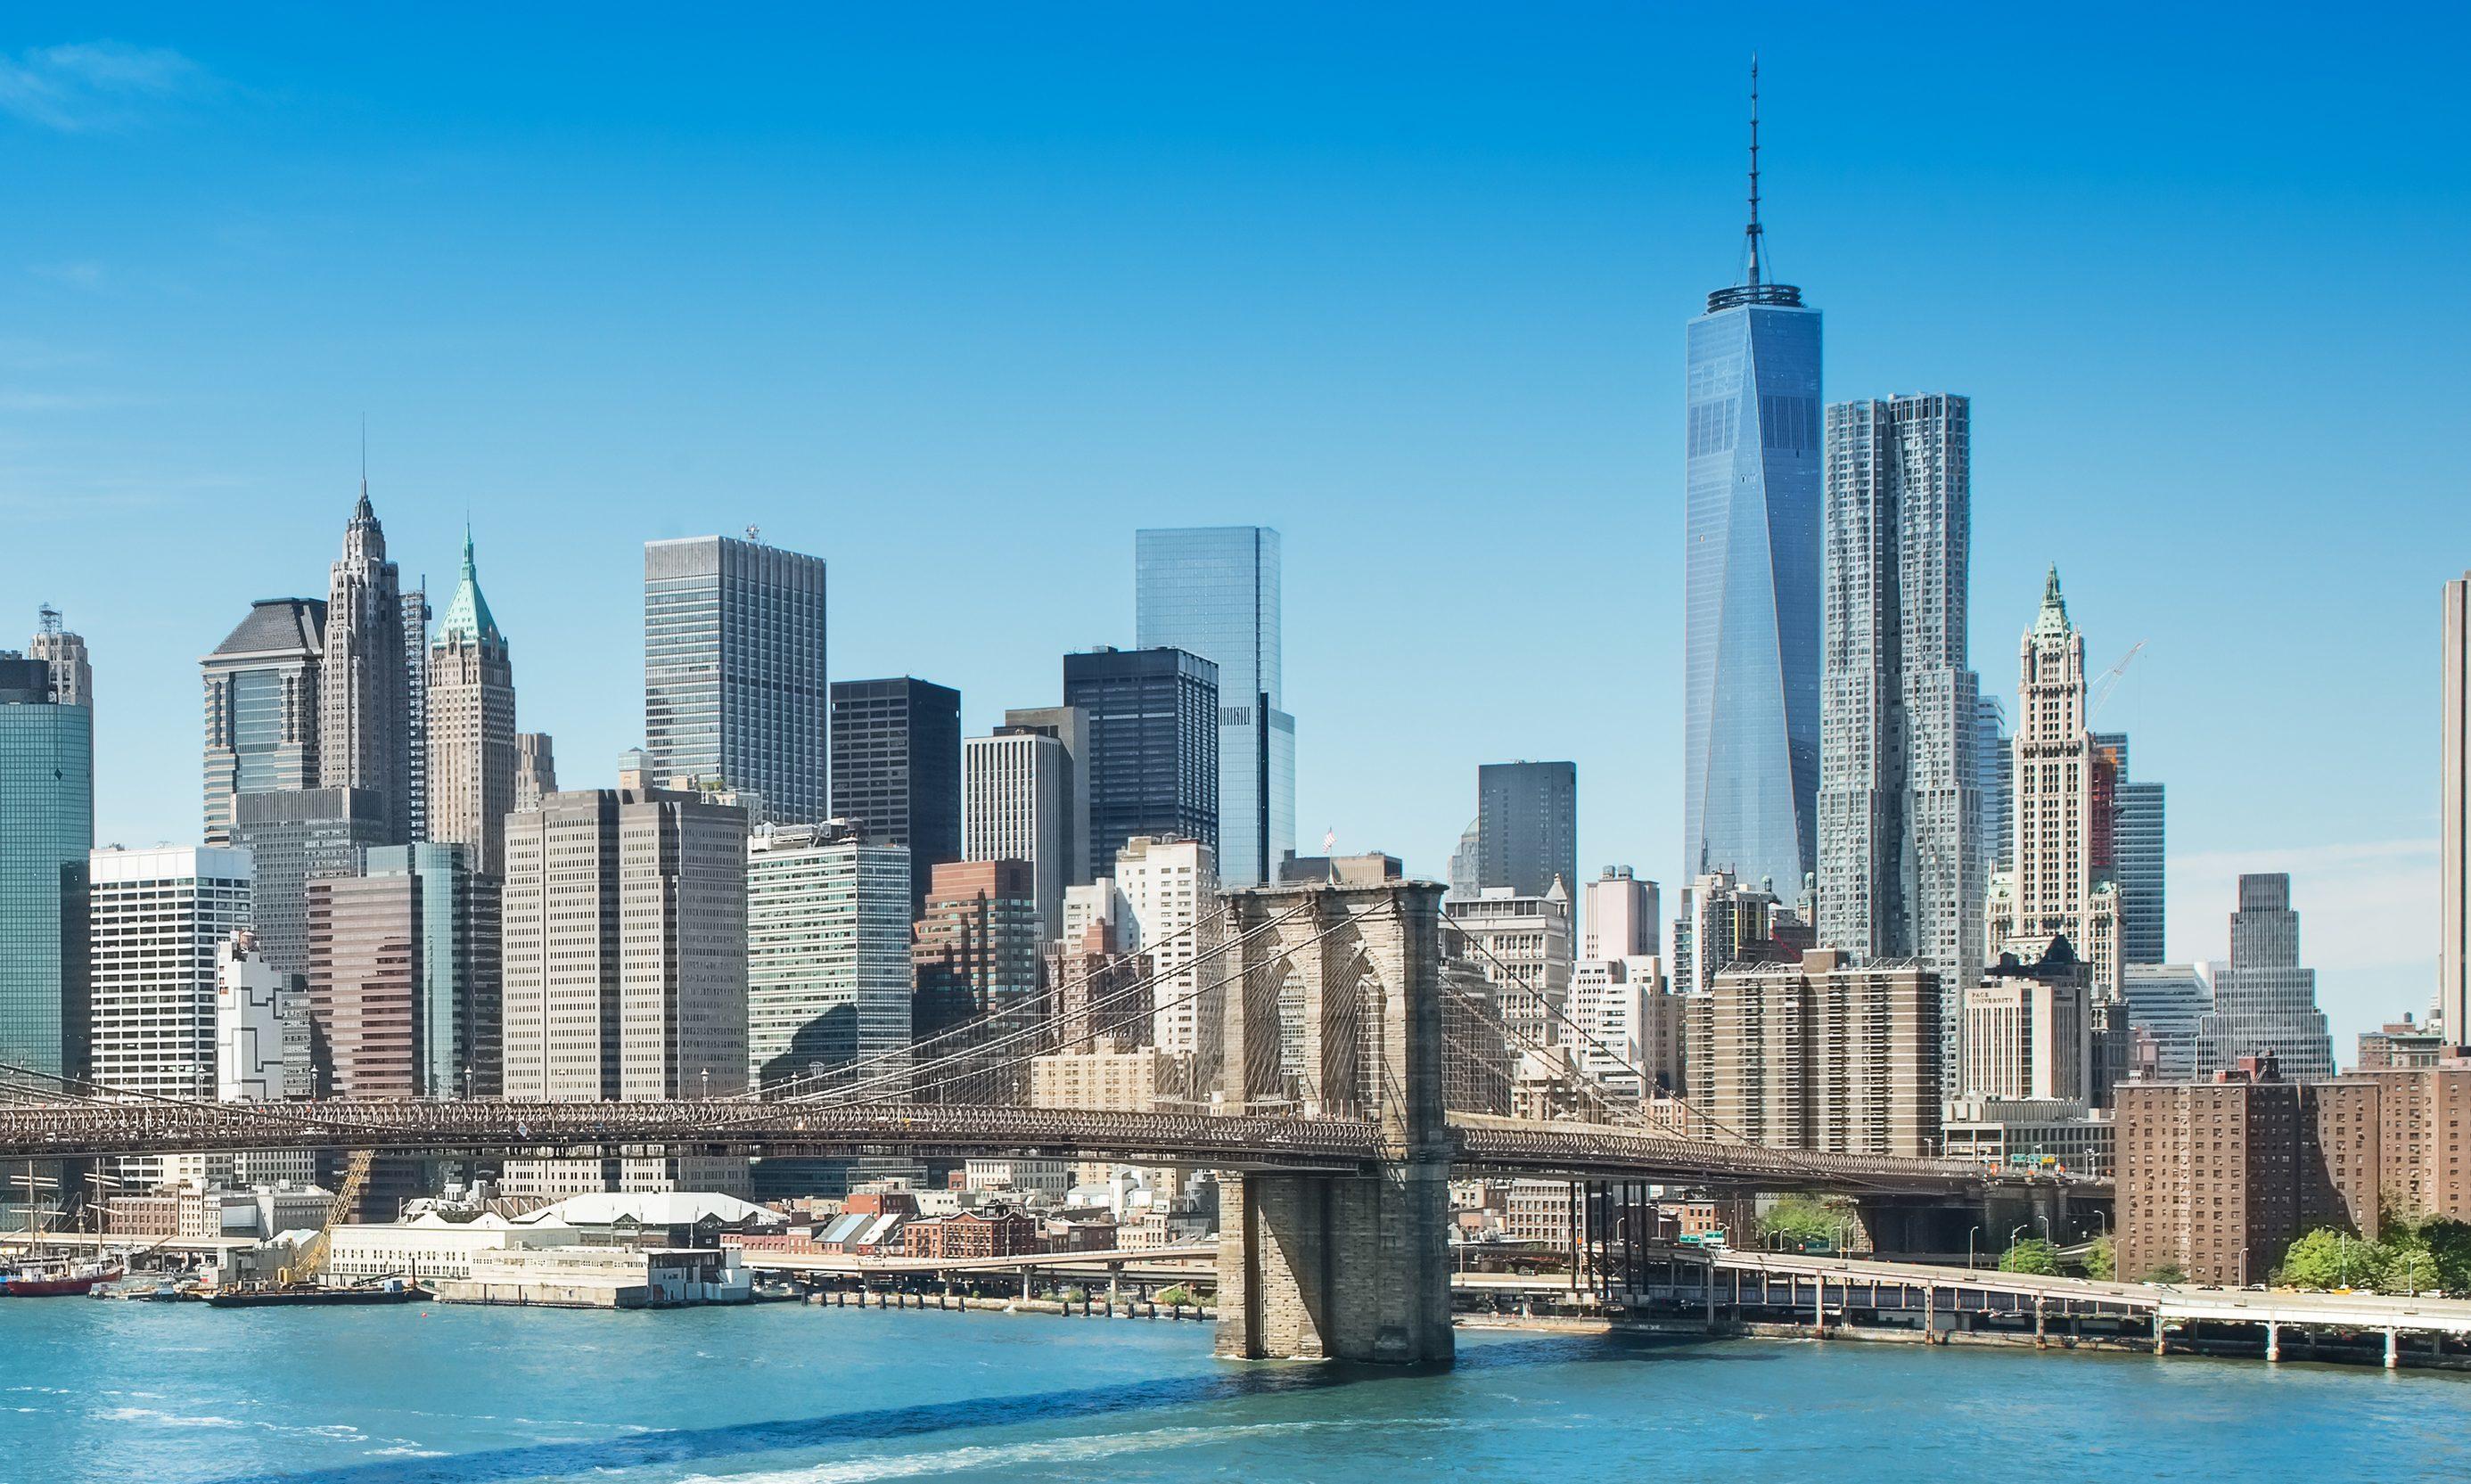 New York skyline, including Brooklyn Bridge (Getty Images)